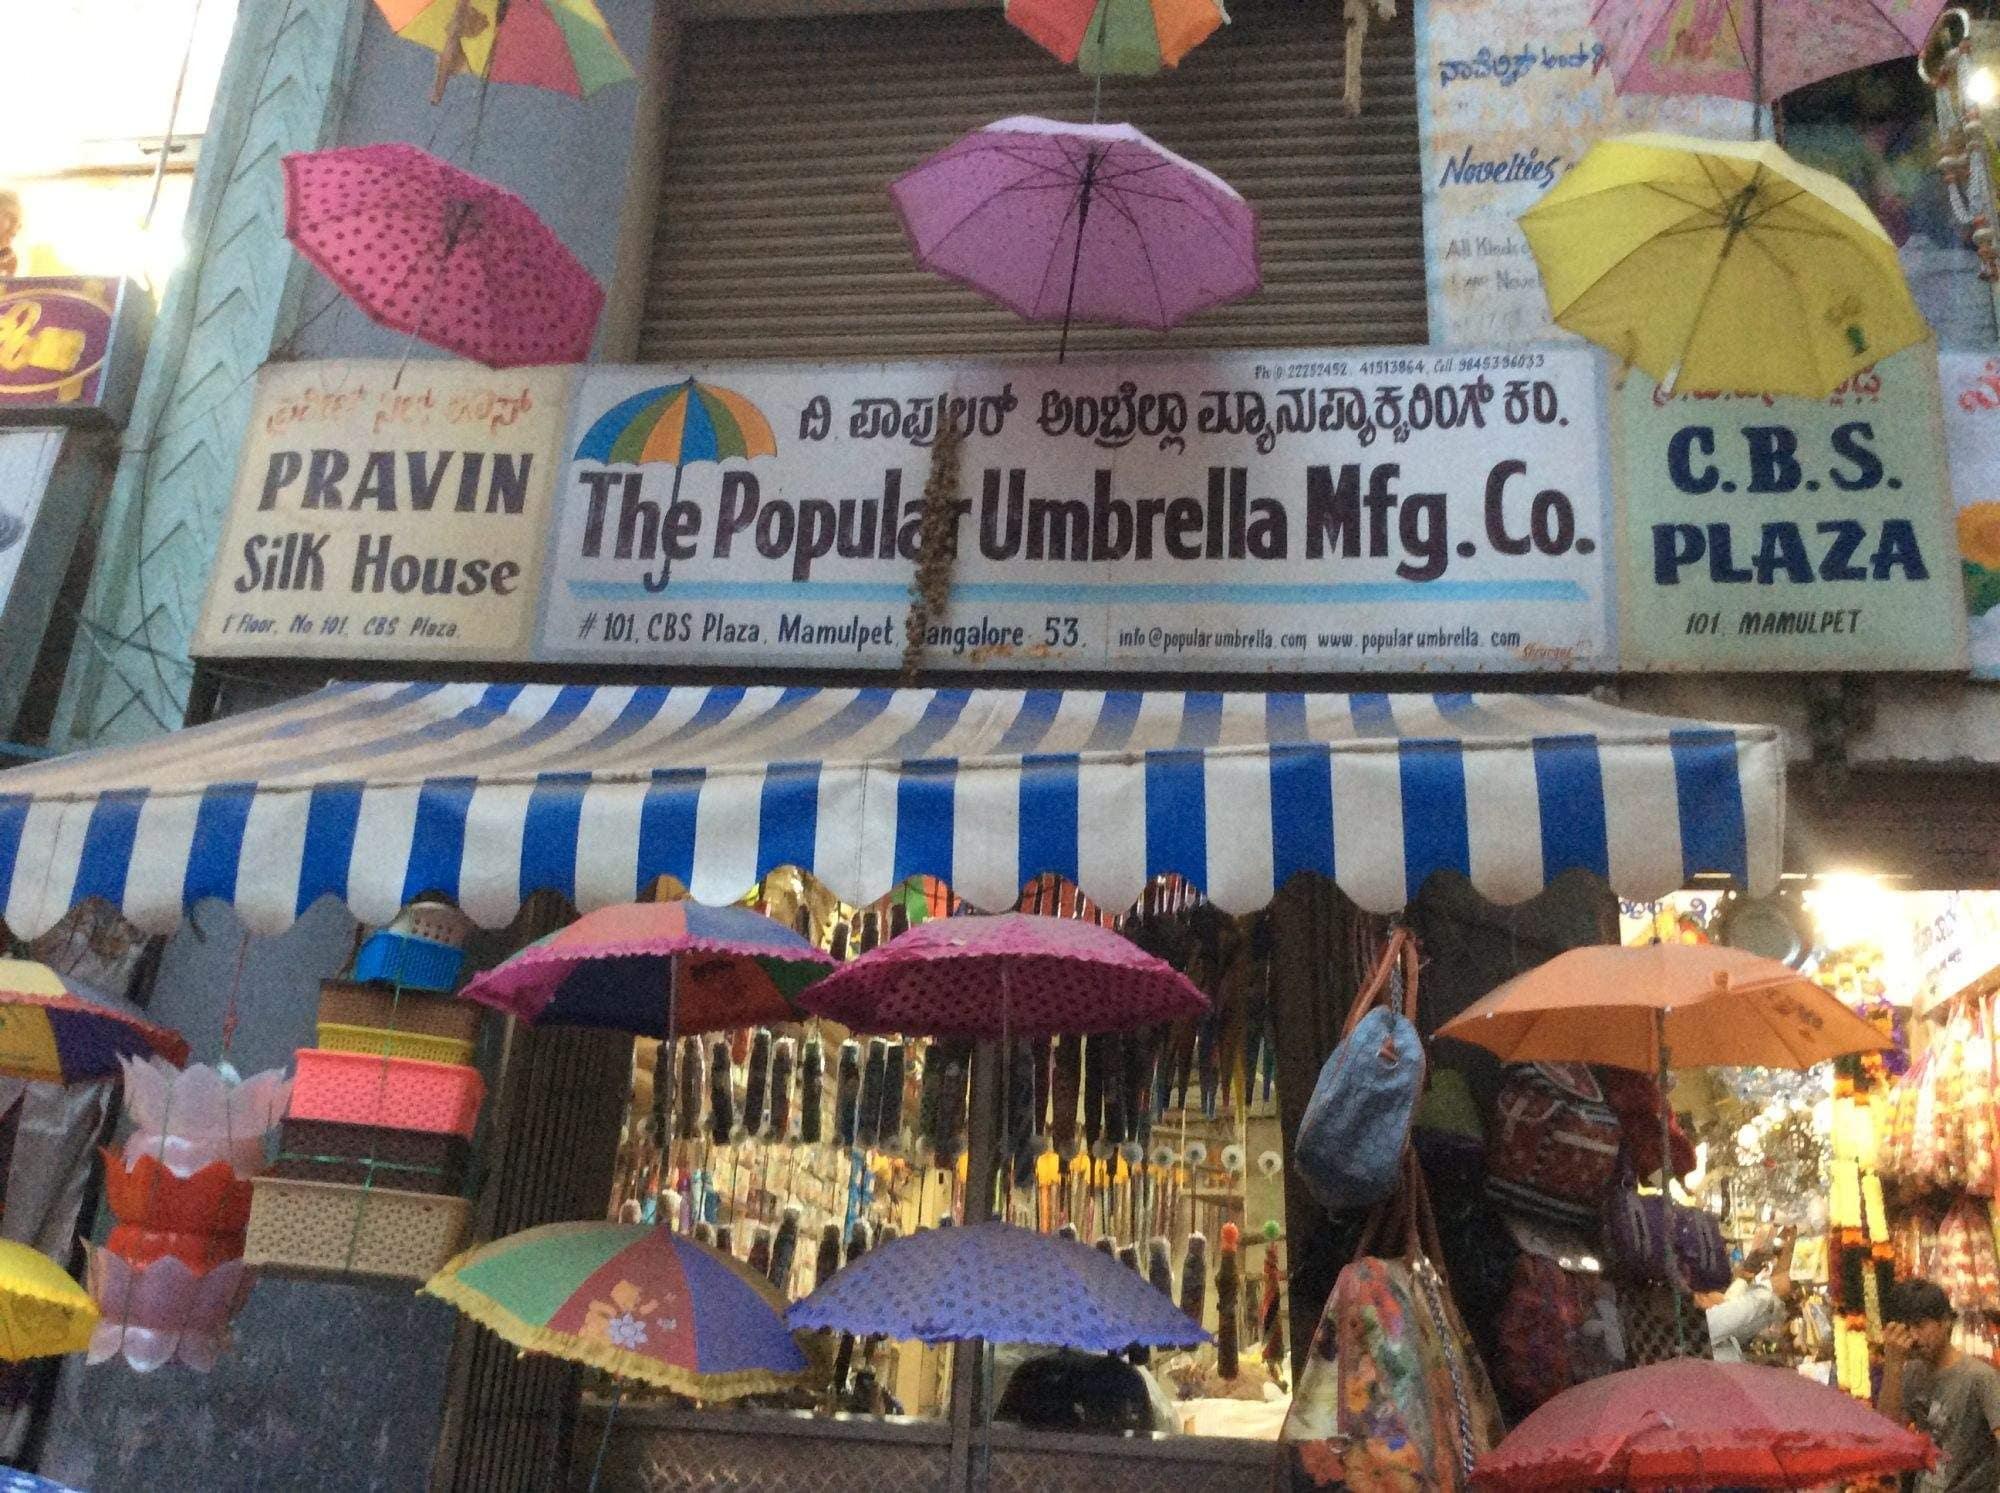 8aef01496ad41 Top 30 Umbrella Manufacturers in M G Road, Bangalore - Justdial